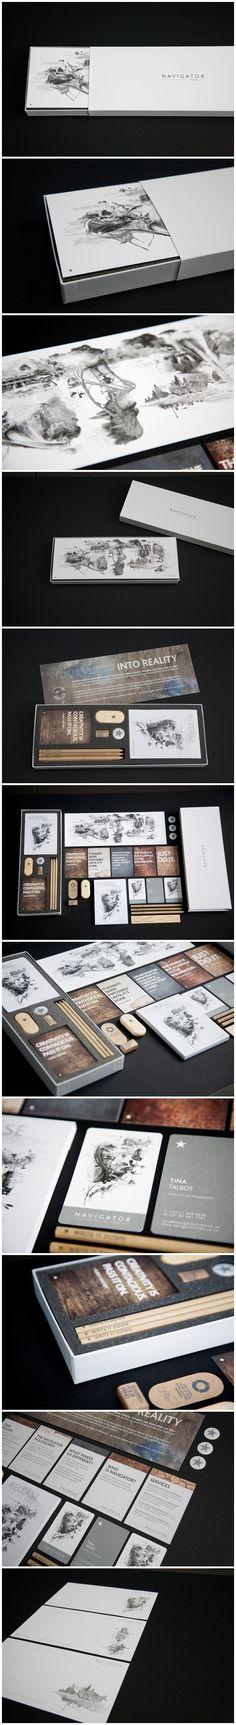 Navigator Films by Brett Atherstone #identity #packaging #branding #marketing PD